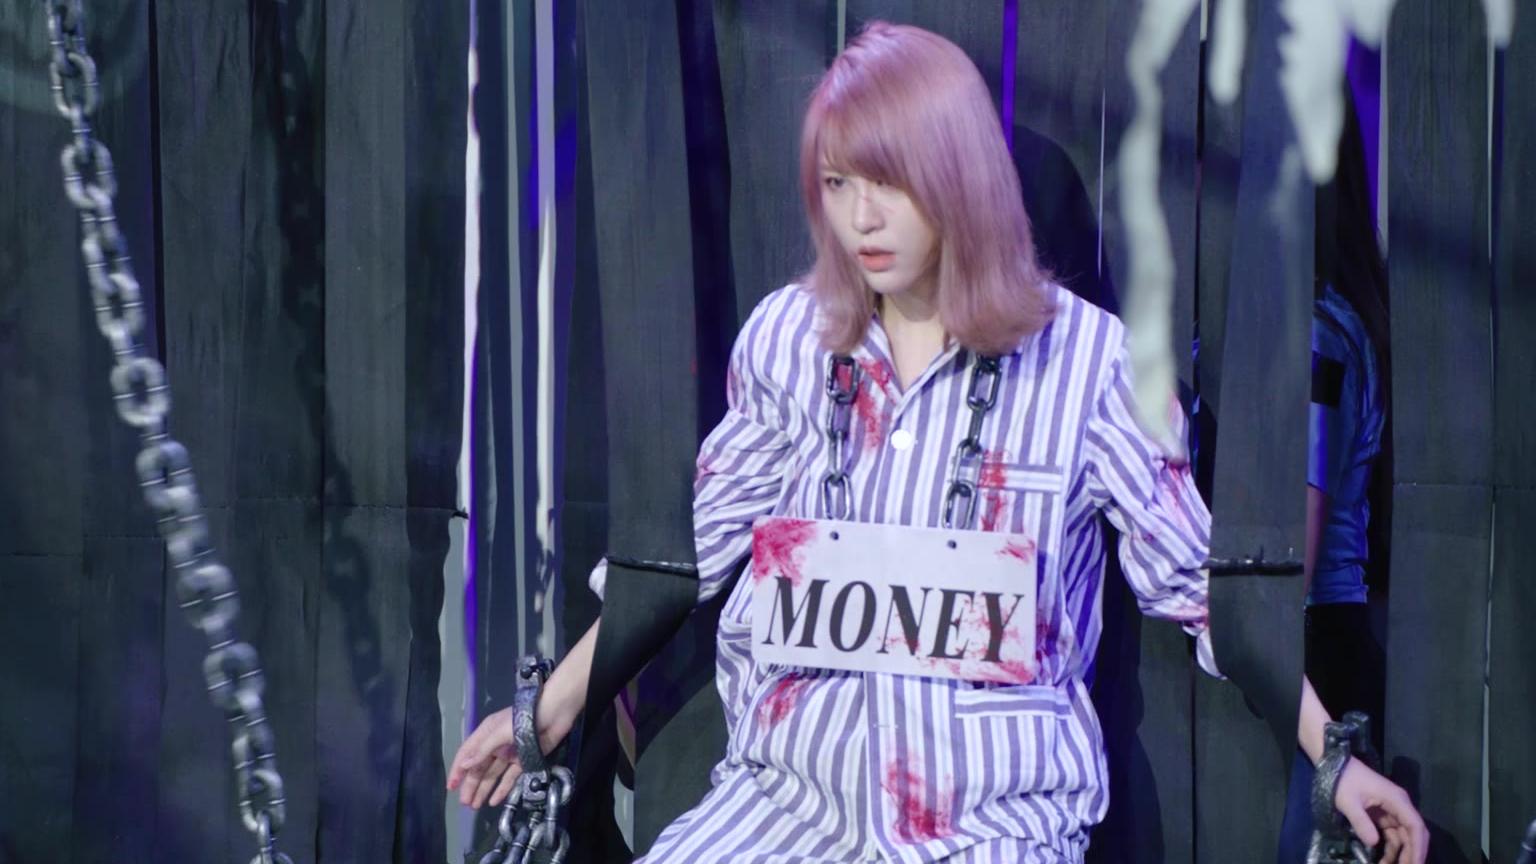 【SNH48】钱蓓婷舞台PV《黑与白》